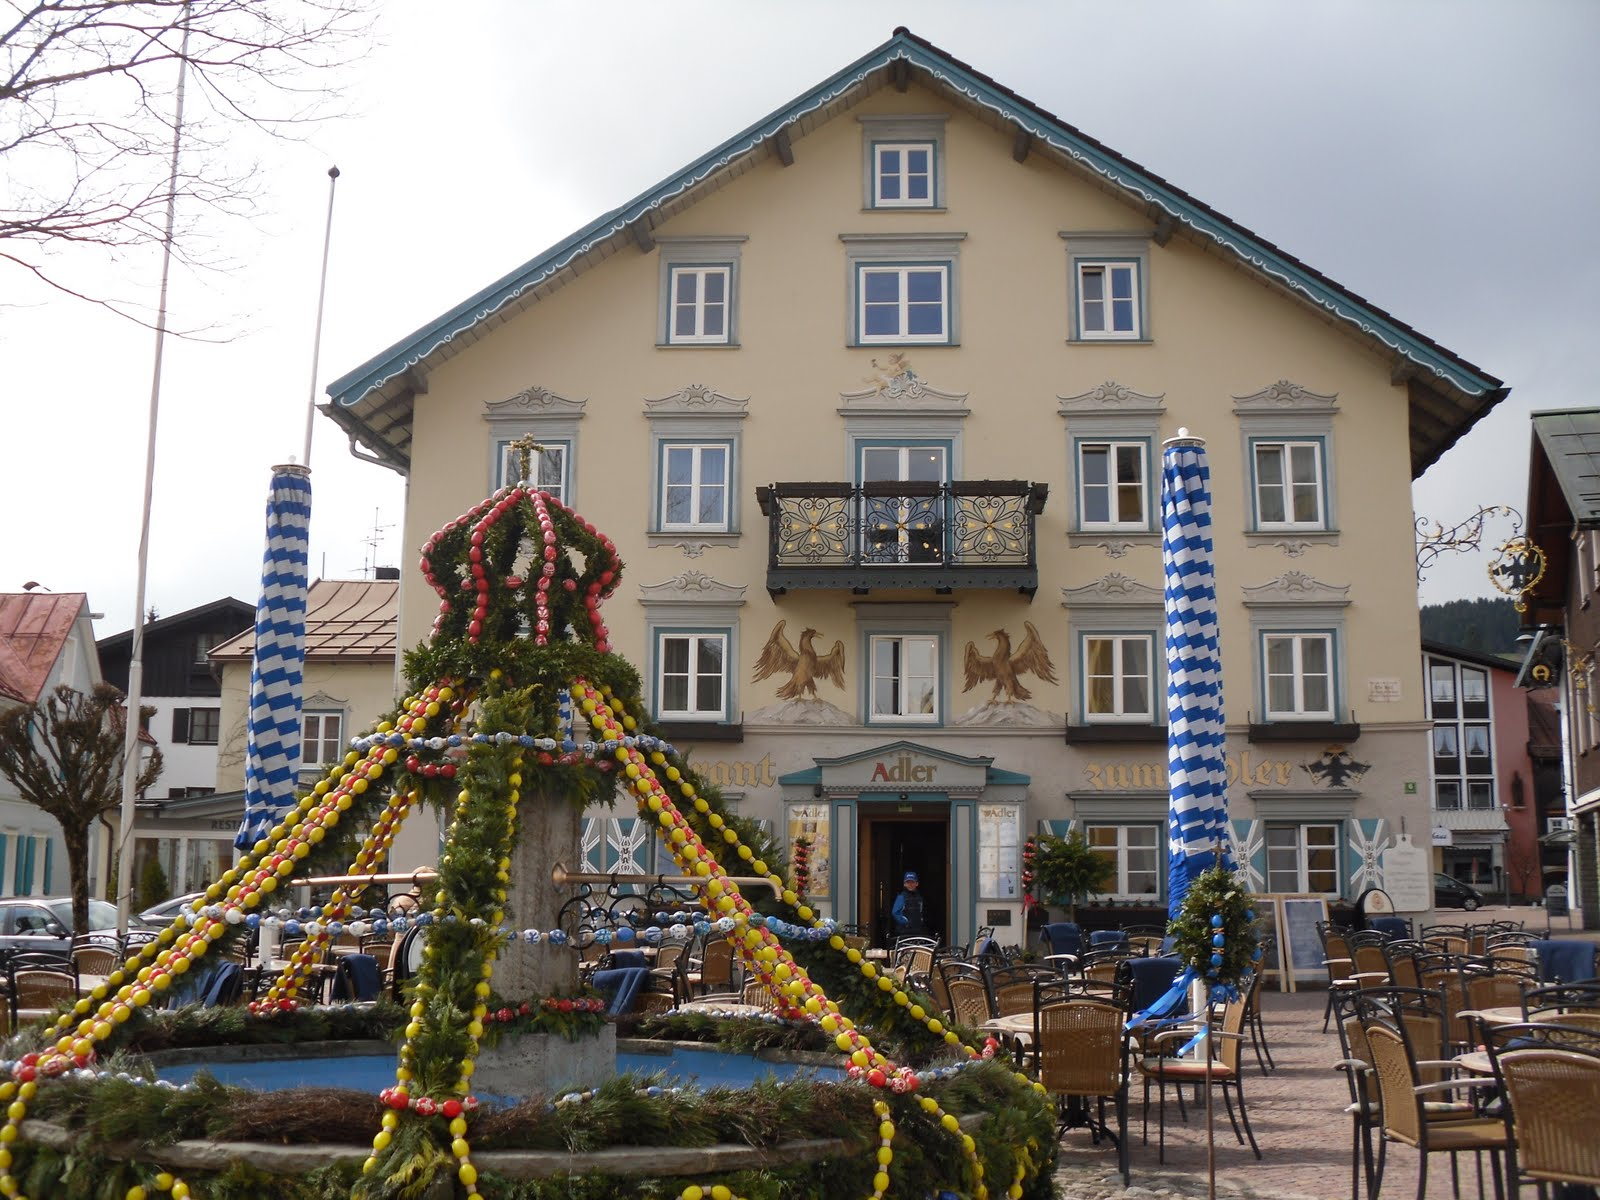 Culinary adventures in europe hotel restaurant adler for Oberstaufen hotel